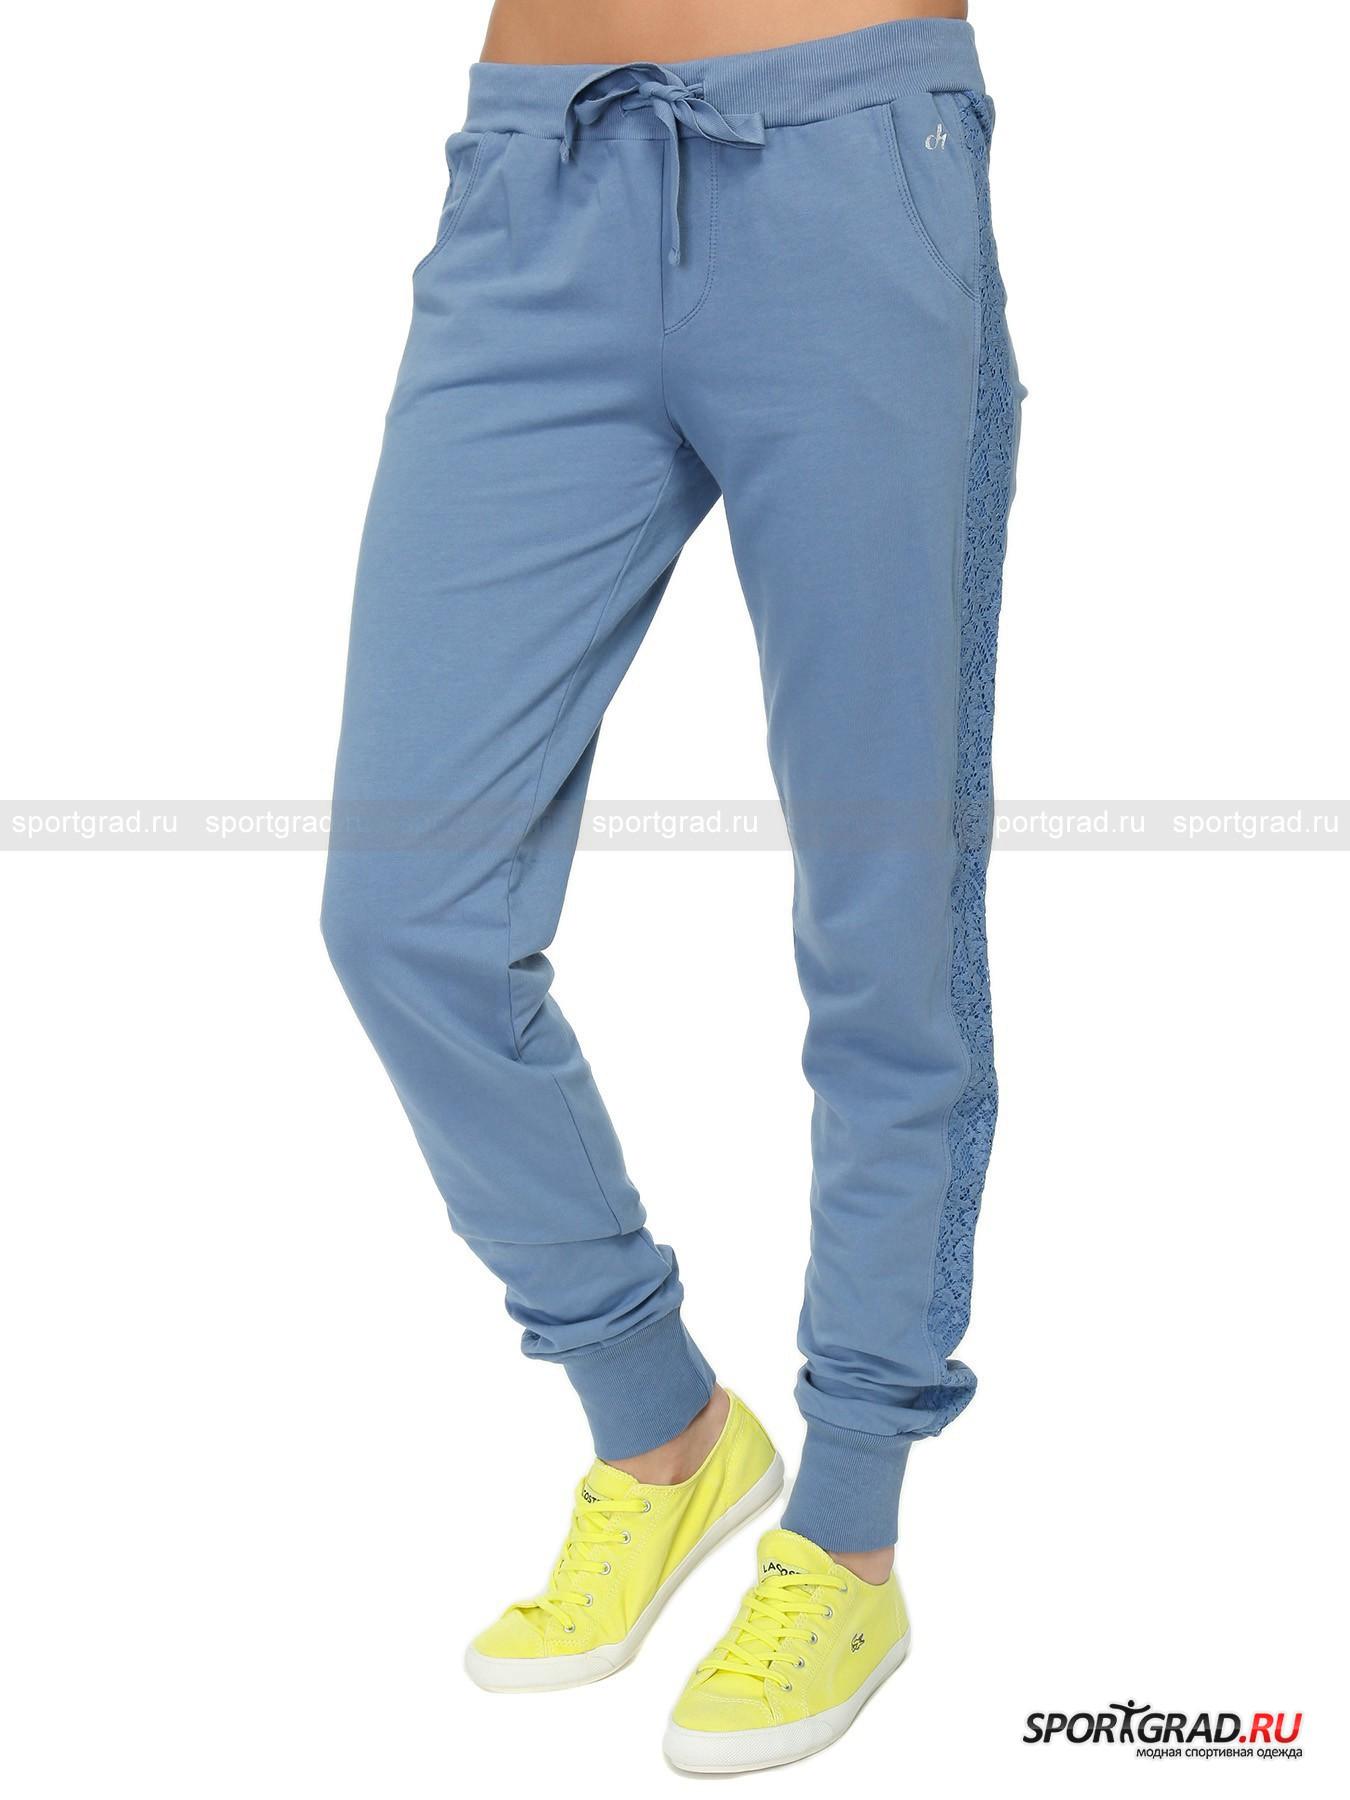 Костюм женский Track suit DEHA от Спортград